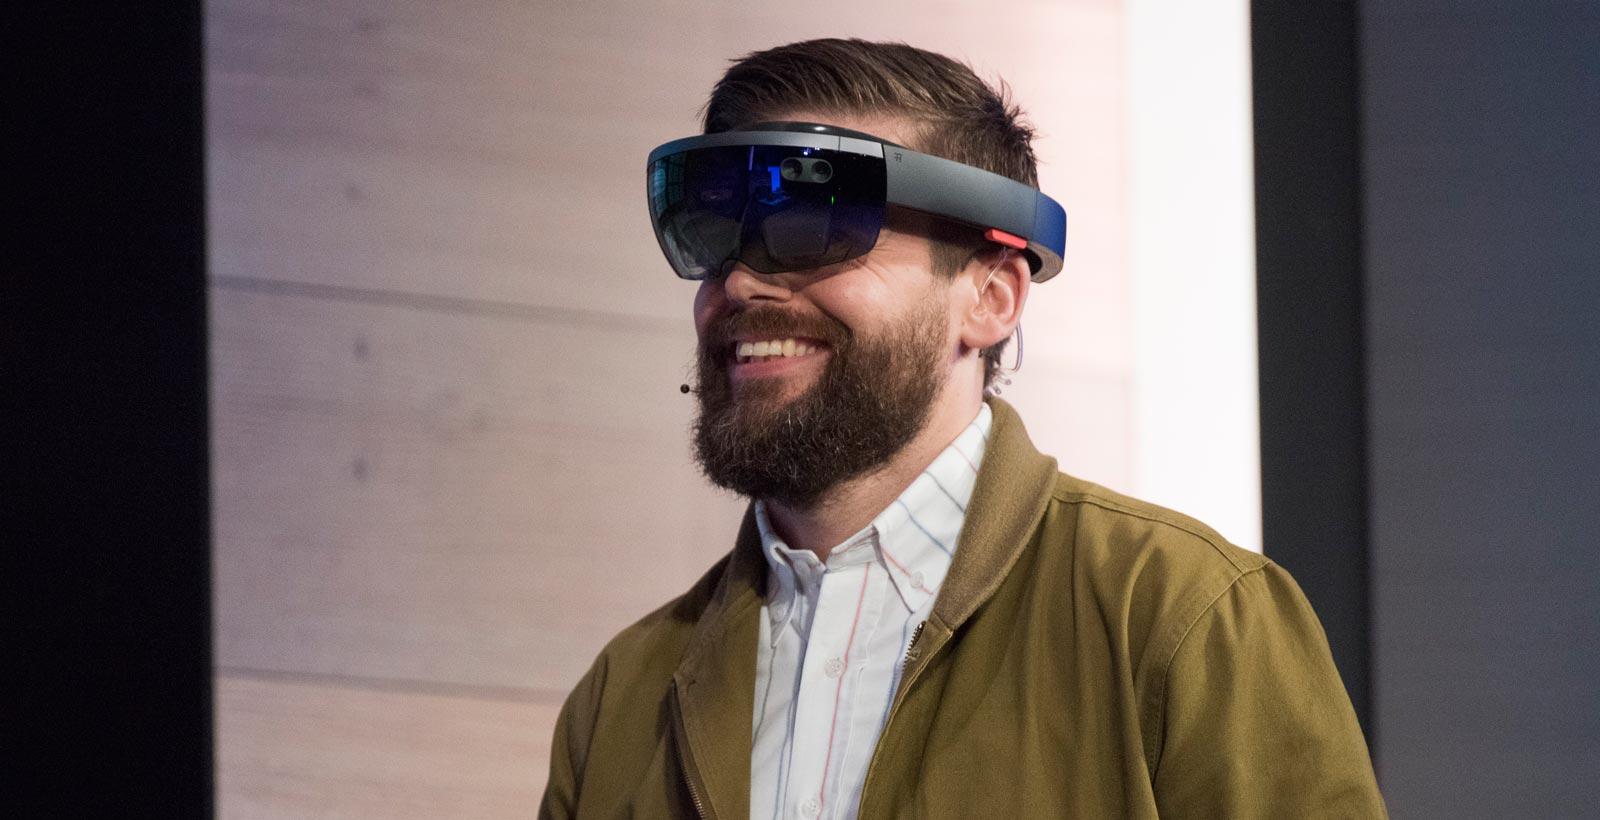 Les HoloLens de Microsoft (Image : The Telegraph).